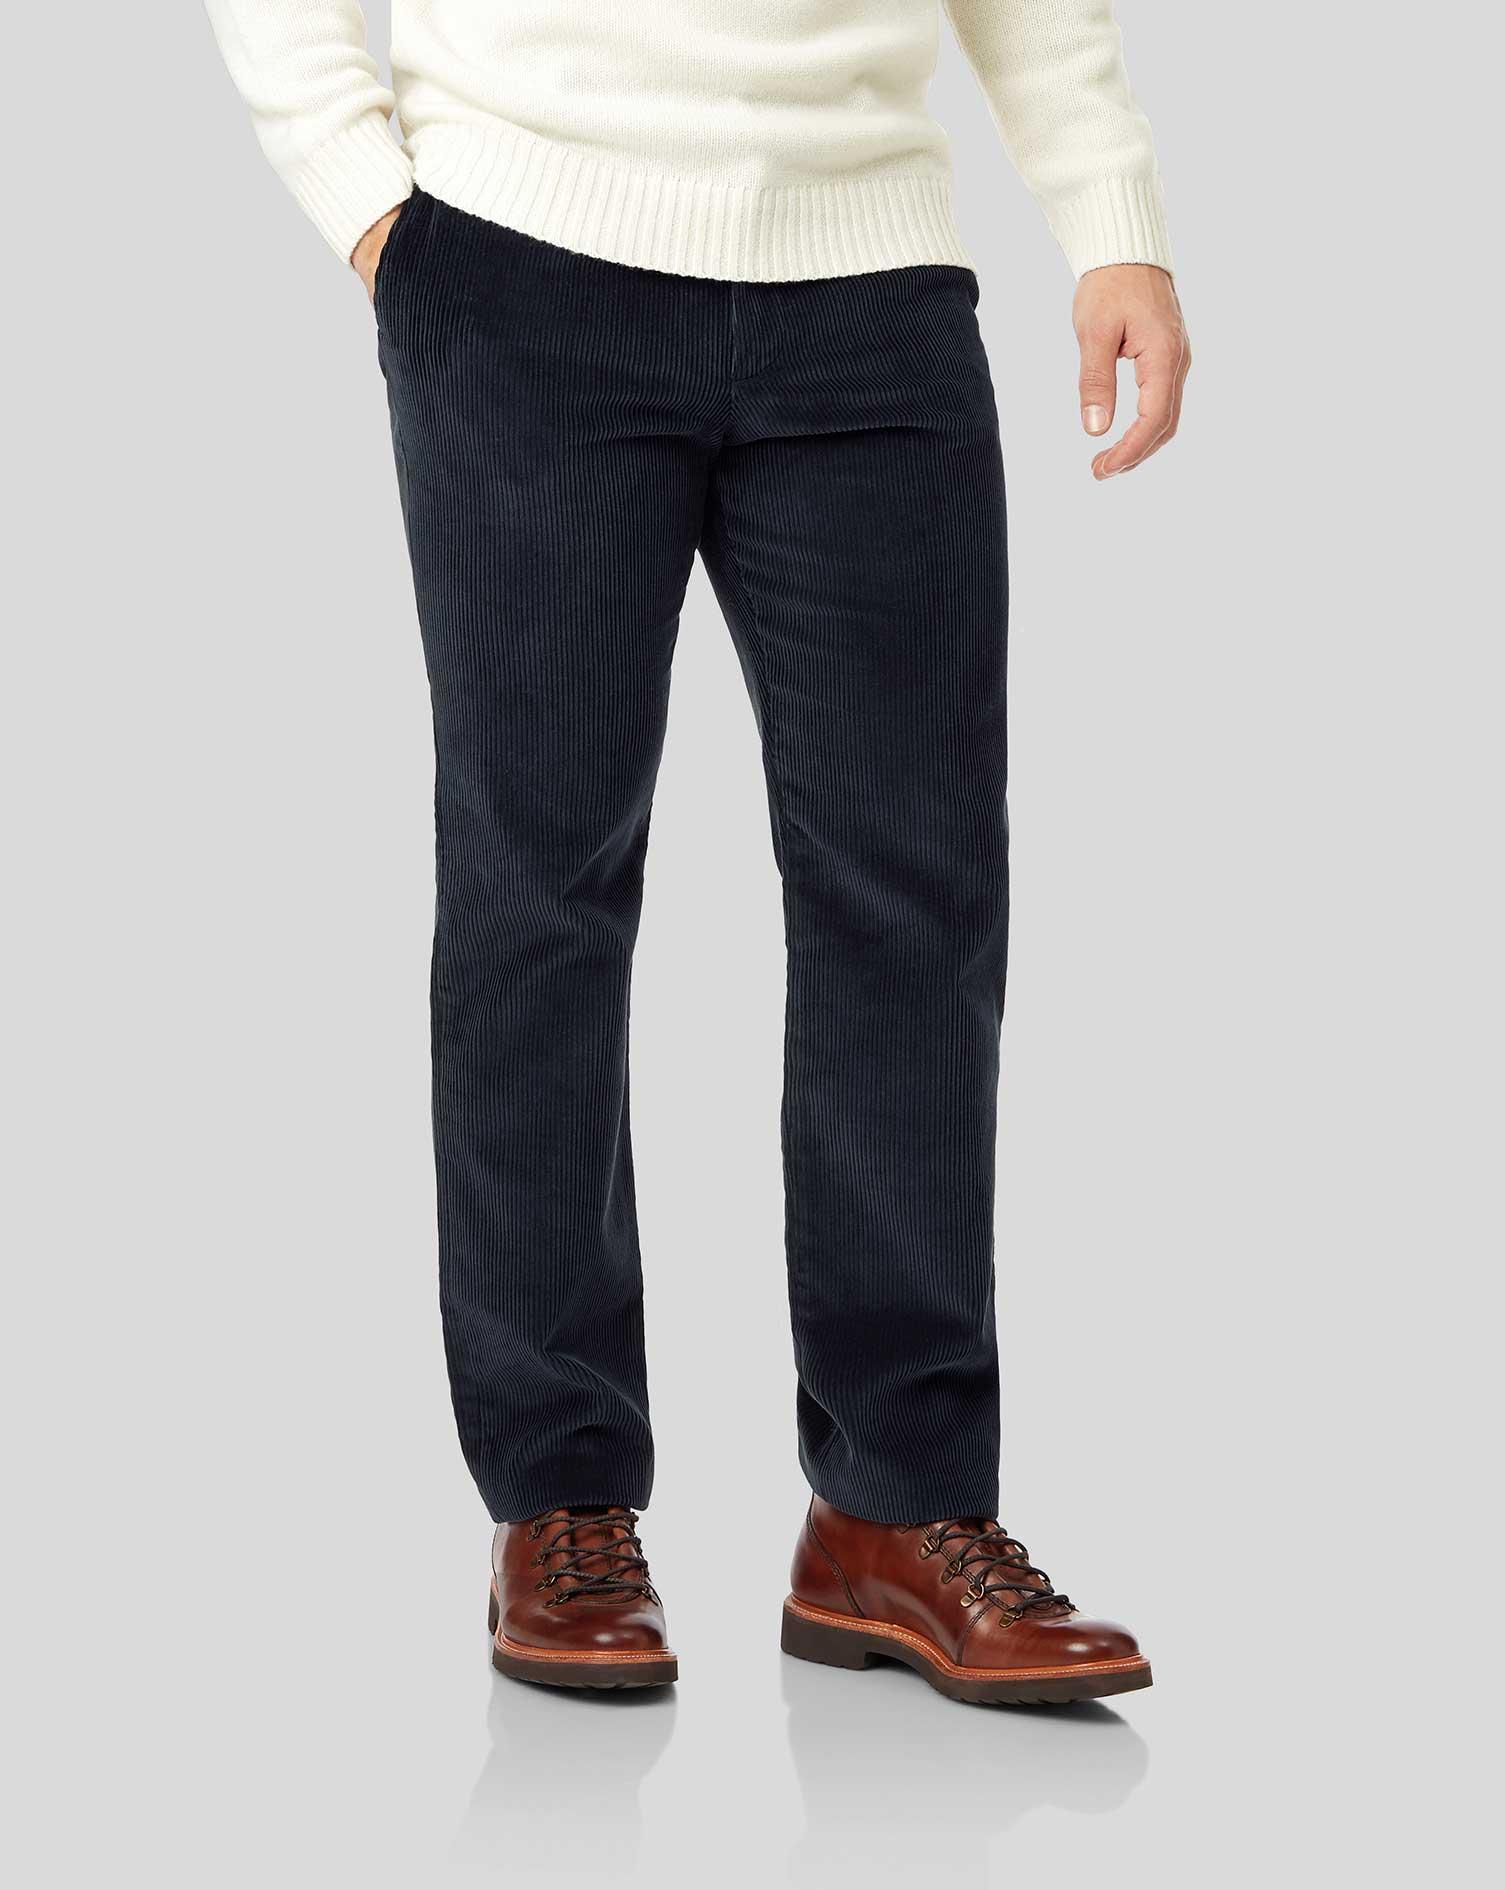 Cotton Navy Jumbo Cord Trousers